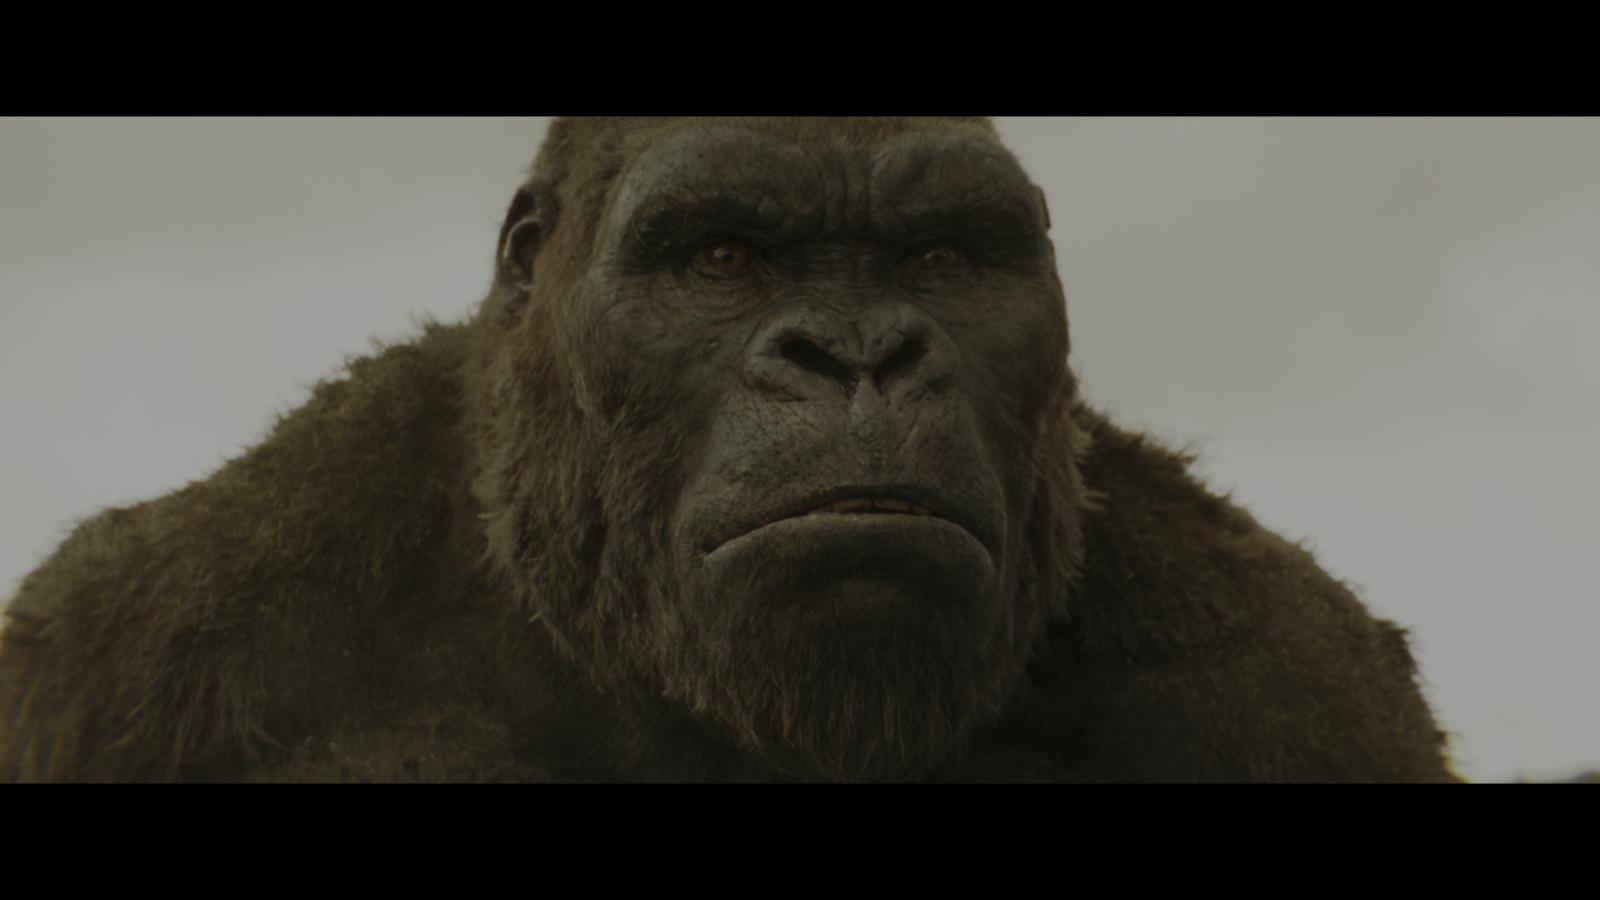 Kong: La isla Calavera (2017) 4K UHD Blu-Ray Completo captura 1